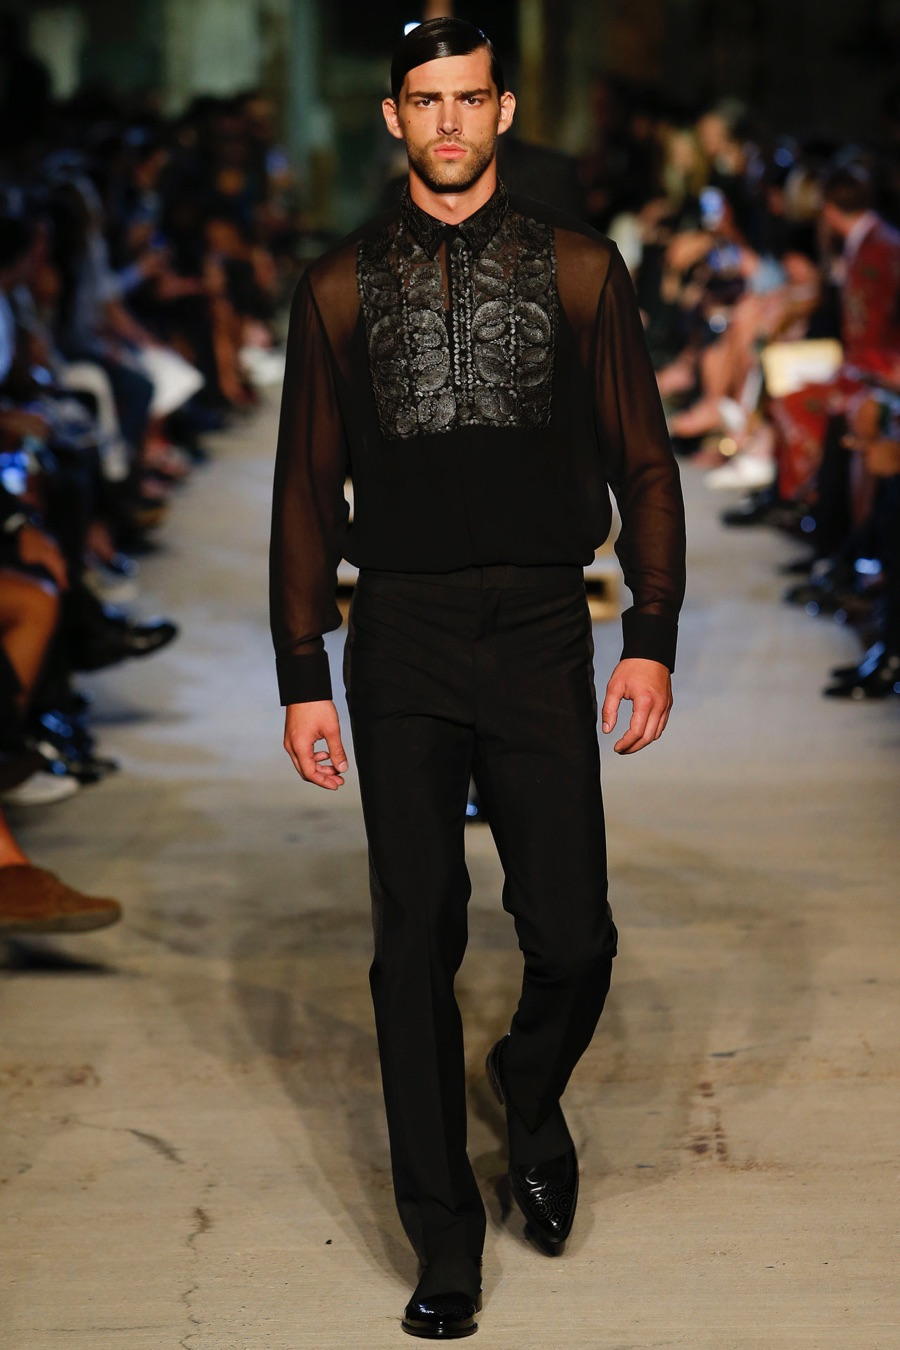 Givenchy-Spring-Summer-2016-Menswear-Collection-New-York-Fashion-Week-009.jpg